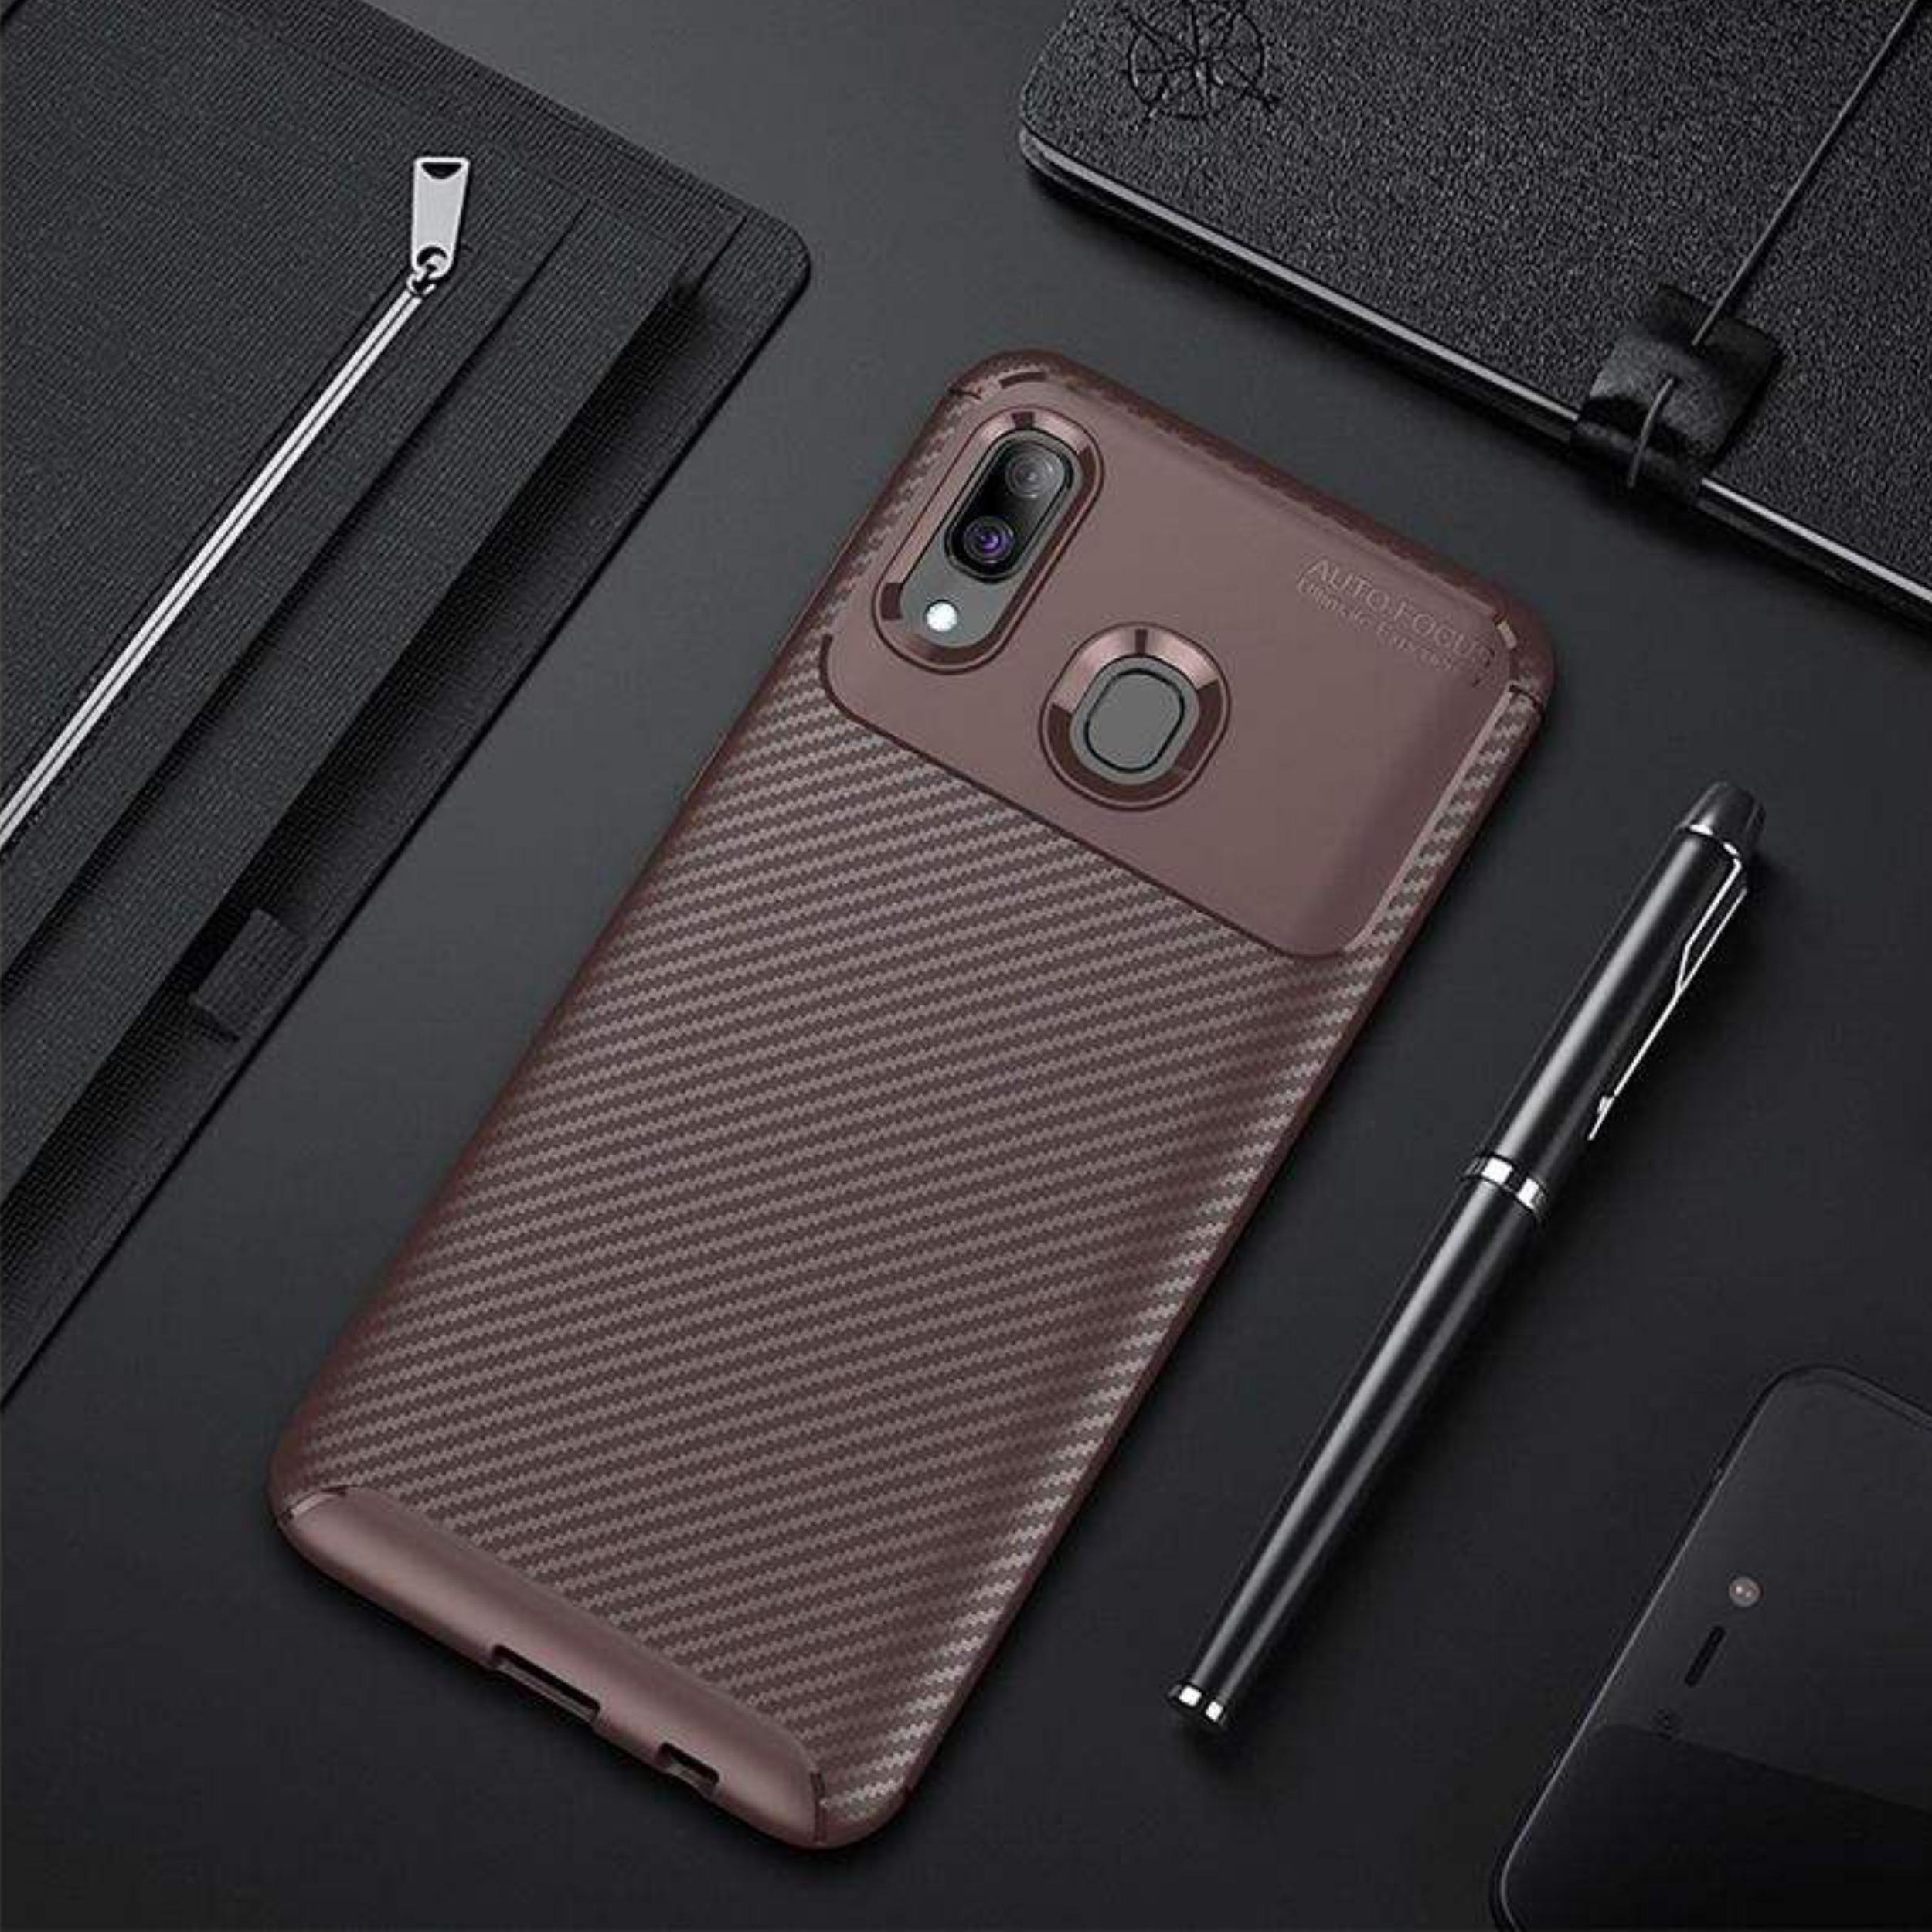 کاور لاین کینگ مدل A21 مناسب برای گوشی موبایل سامسونگ Galaxy A20/ A30/M10s thumb 2 11